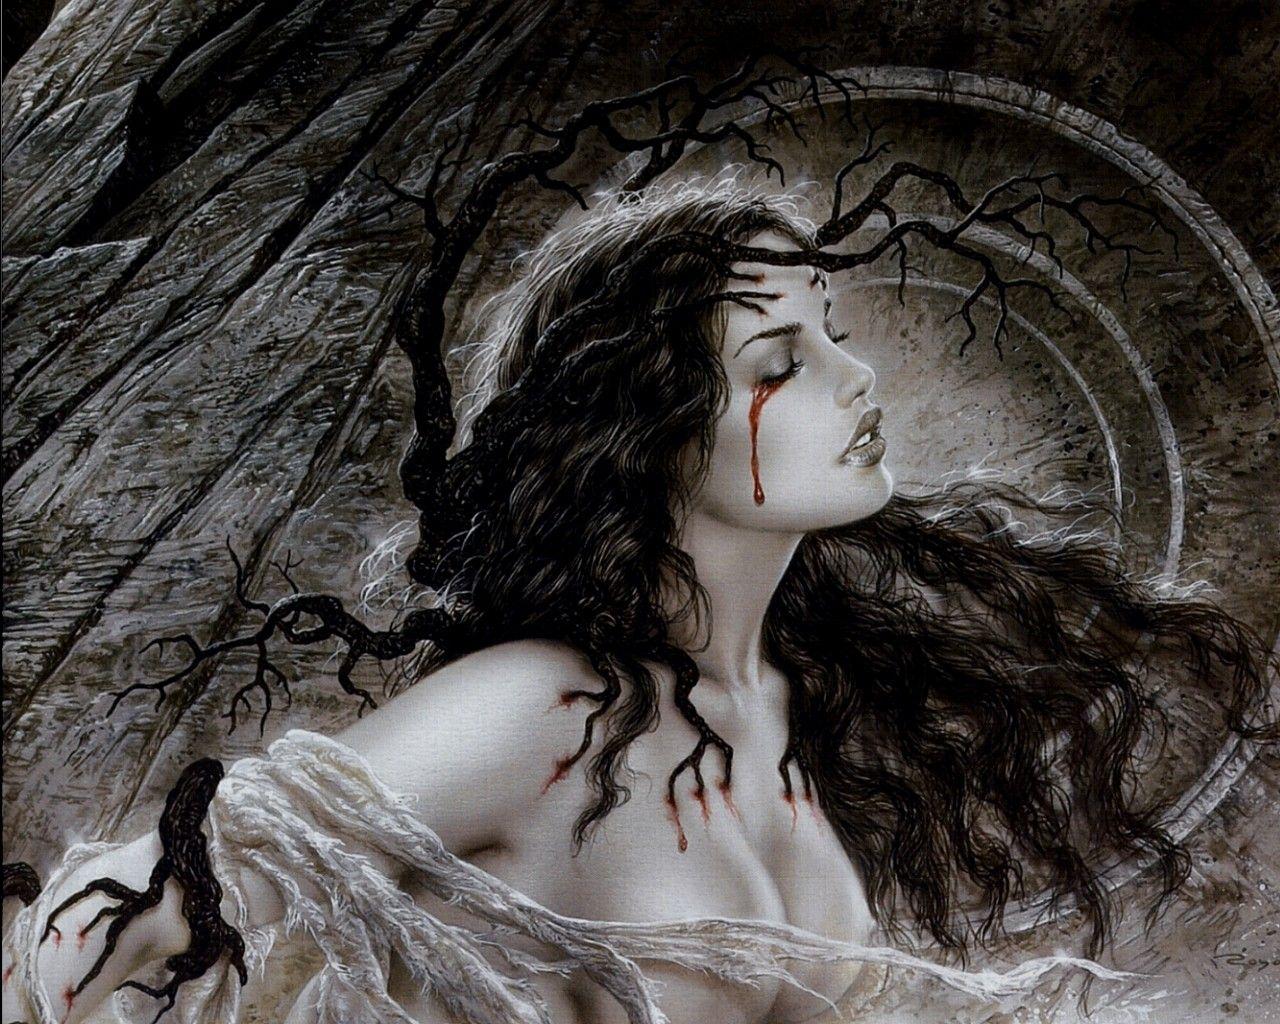 Risultato della ricerca immagini di Google per http://api.ning.com/files/KshsYxsxv-gd*6CcfVDJcuFA2iIxGawZIoyupe6hDJDp6UL1LtlIeNXmUwp*iChroHUpAk5hm9owUAmjGpIcWyYHV3GPQQyz/Fantasy_Art_Luis_Royo_061.jpg